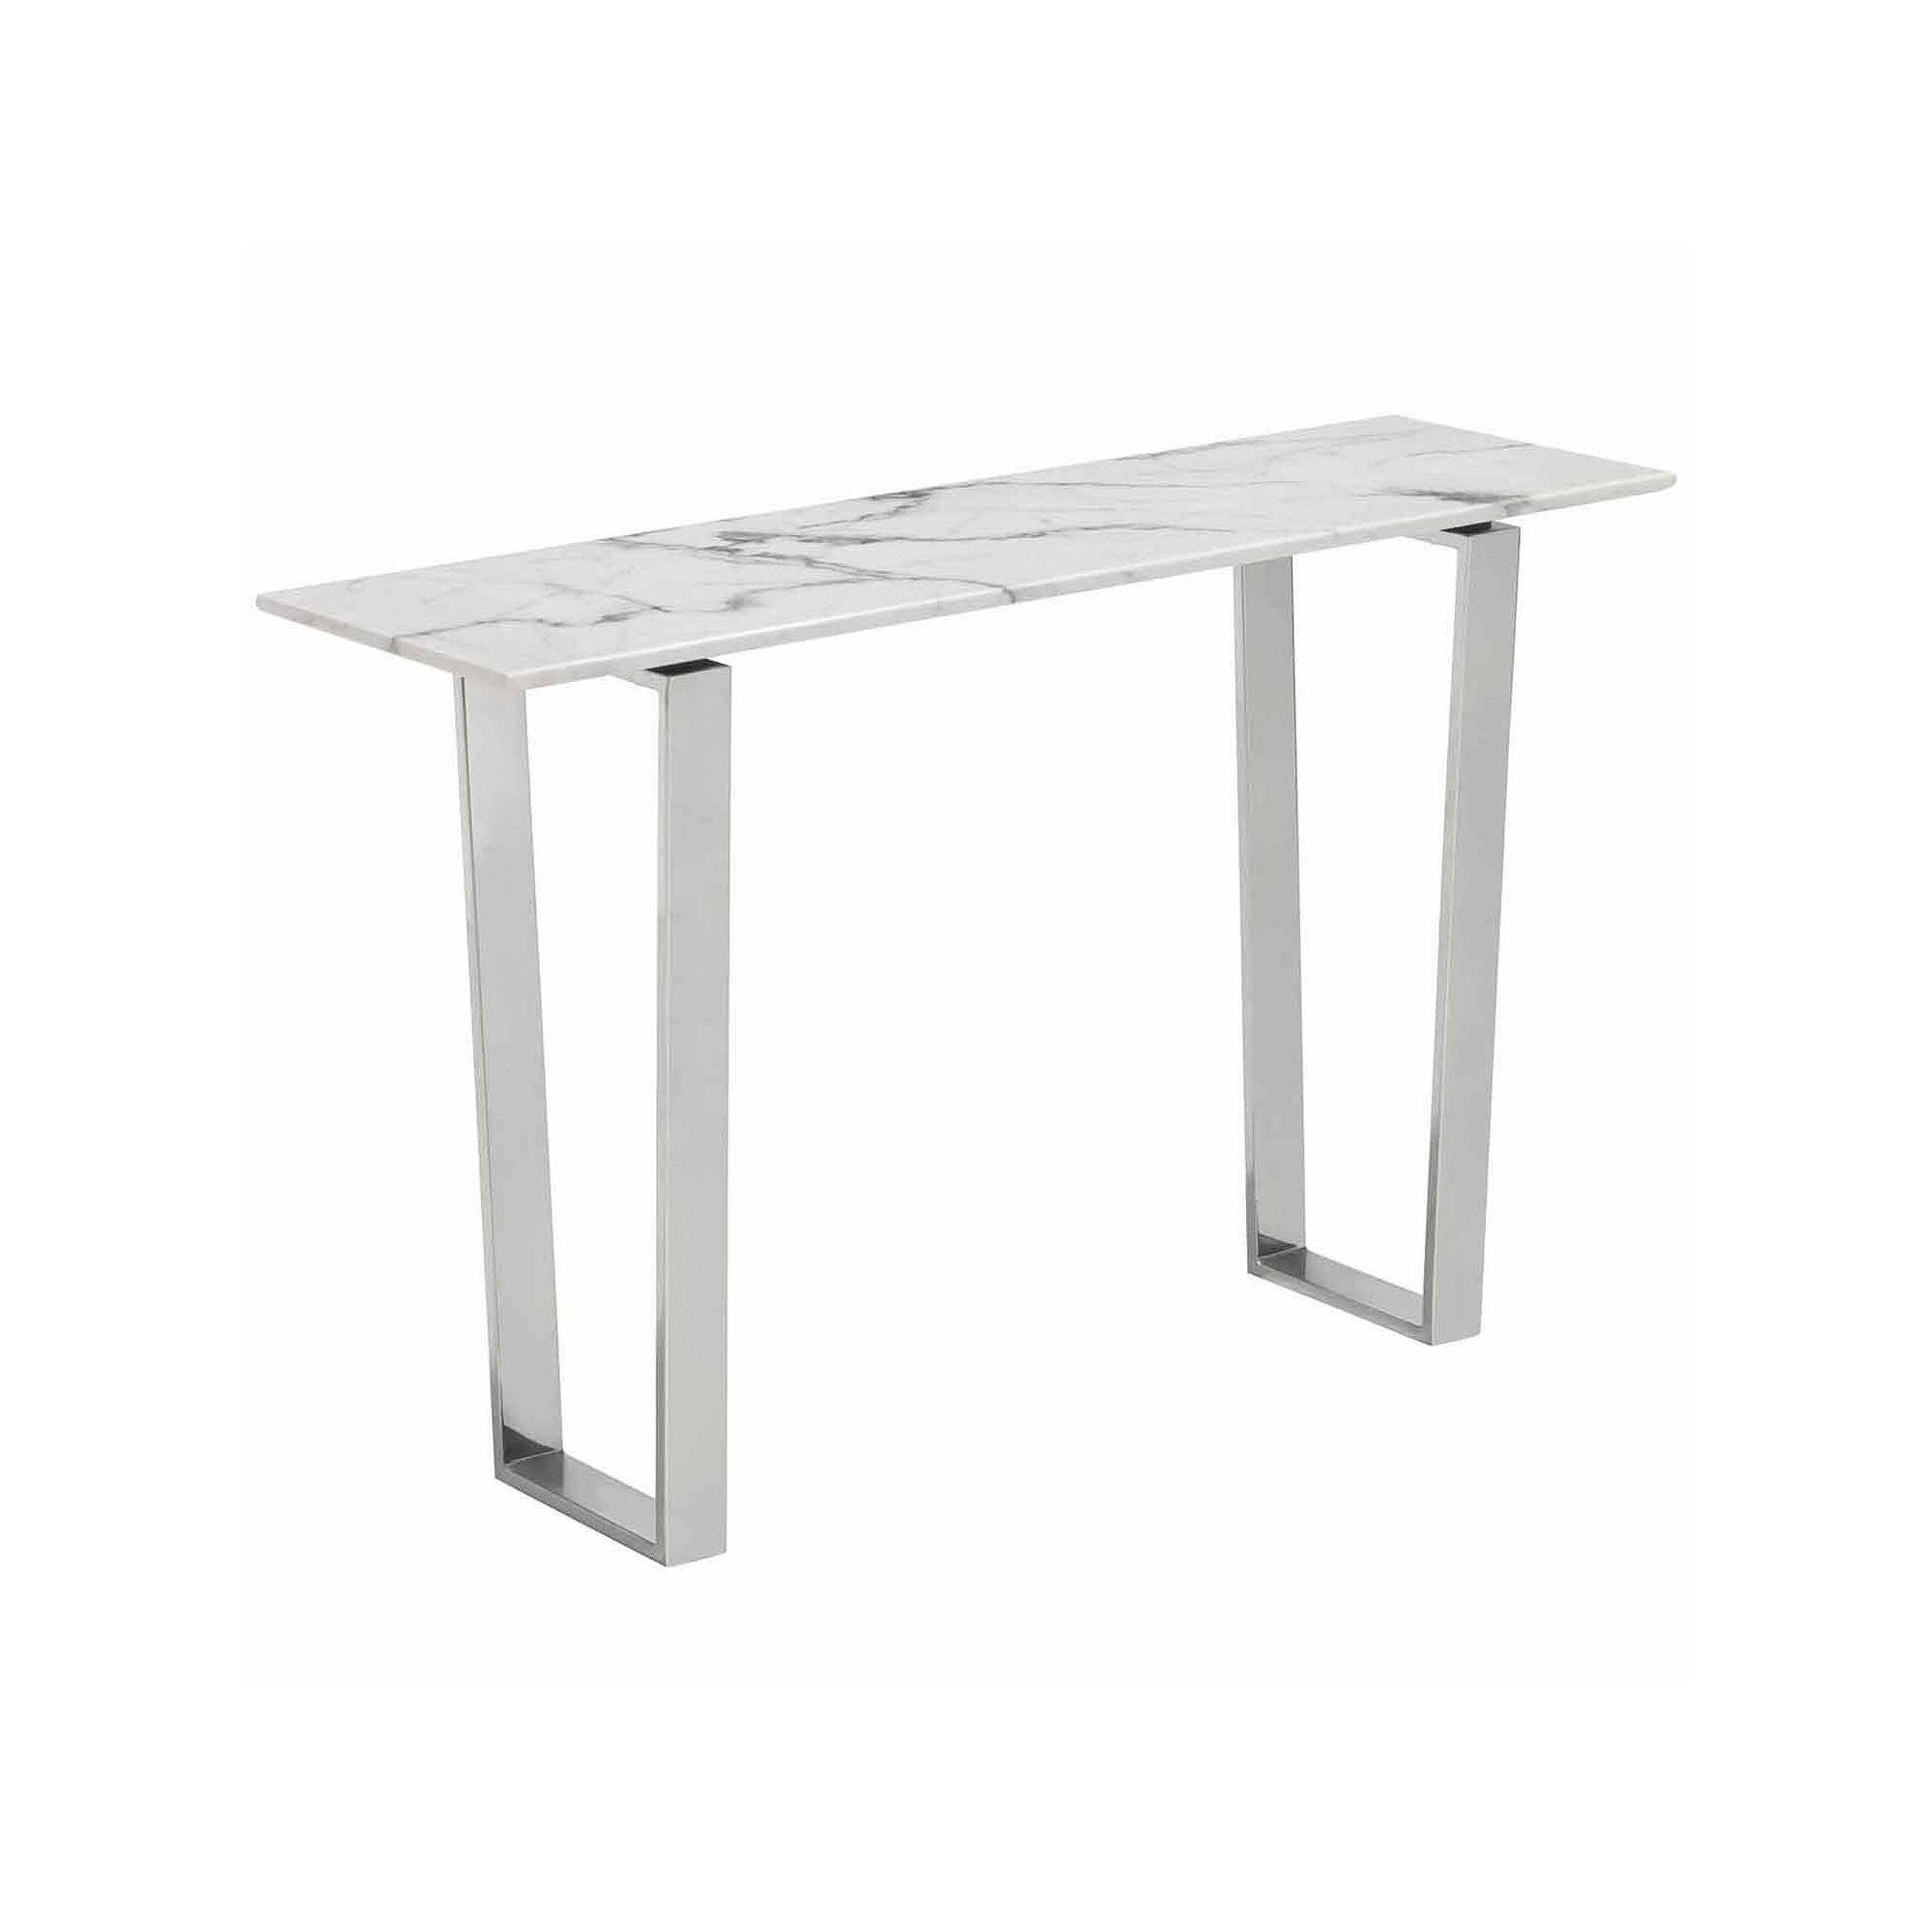 Zuo Modern Atlas Console Table